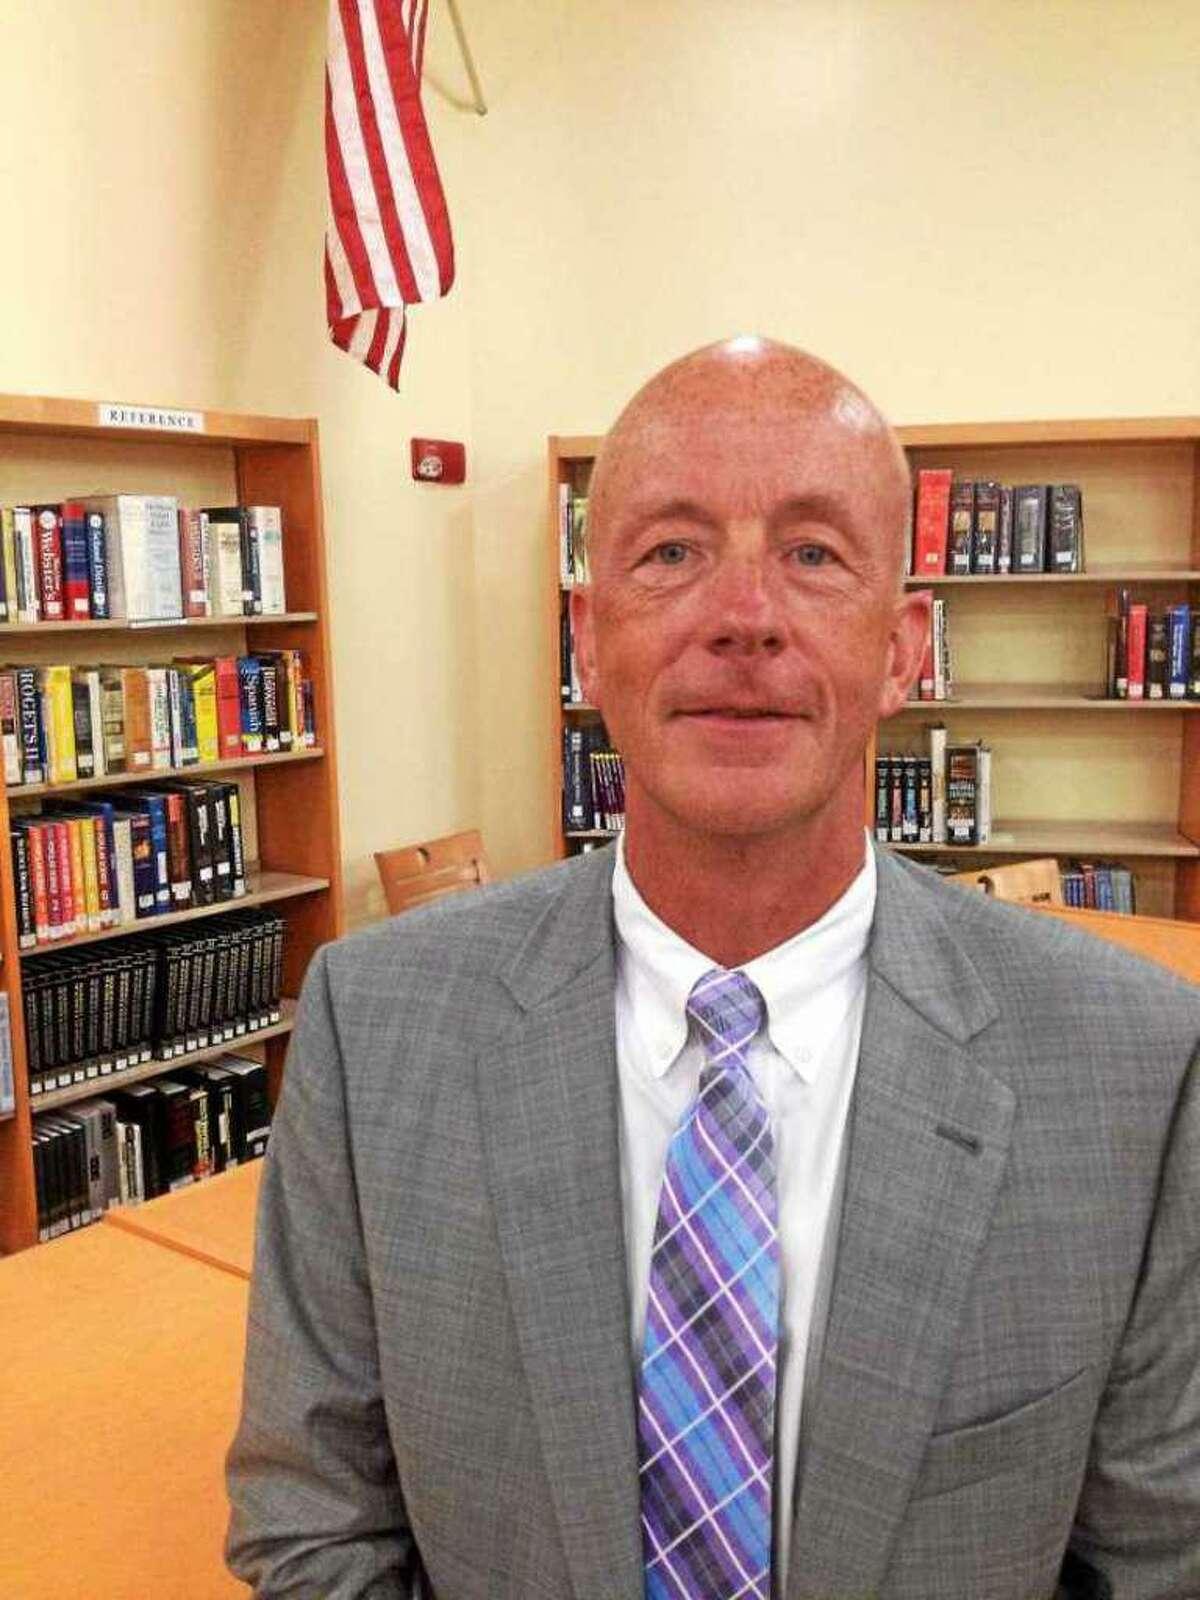 Portland Superintendent of Schools Philip B. O'Reilly